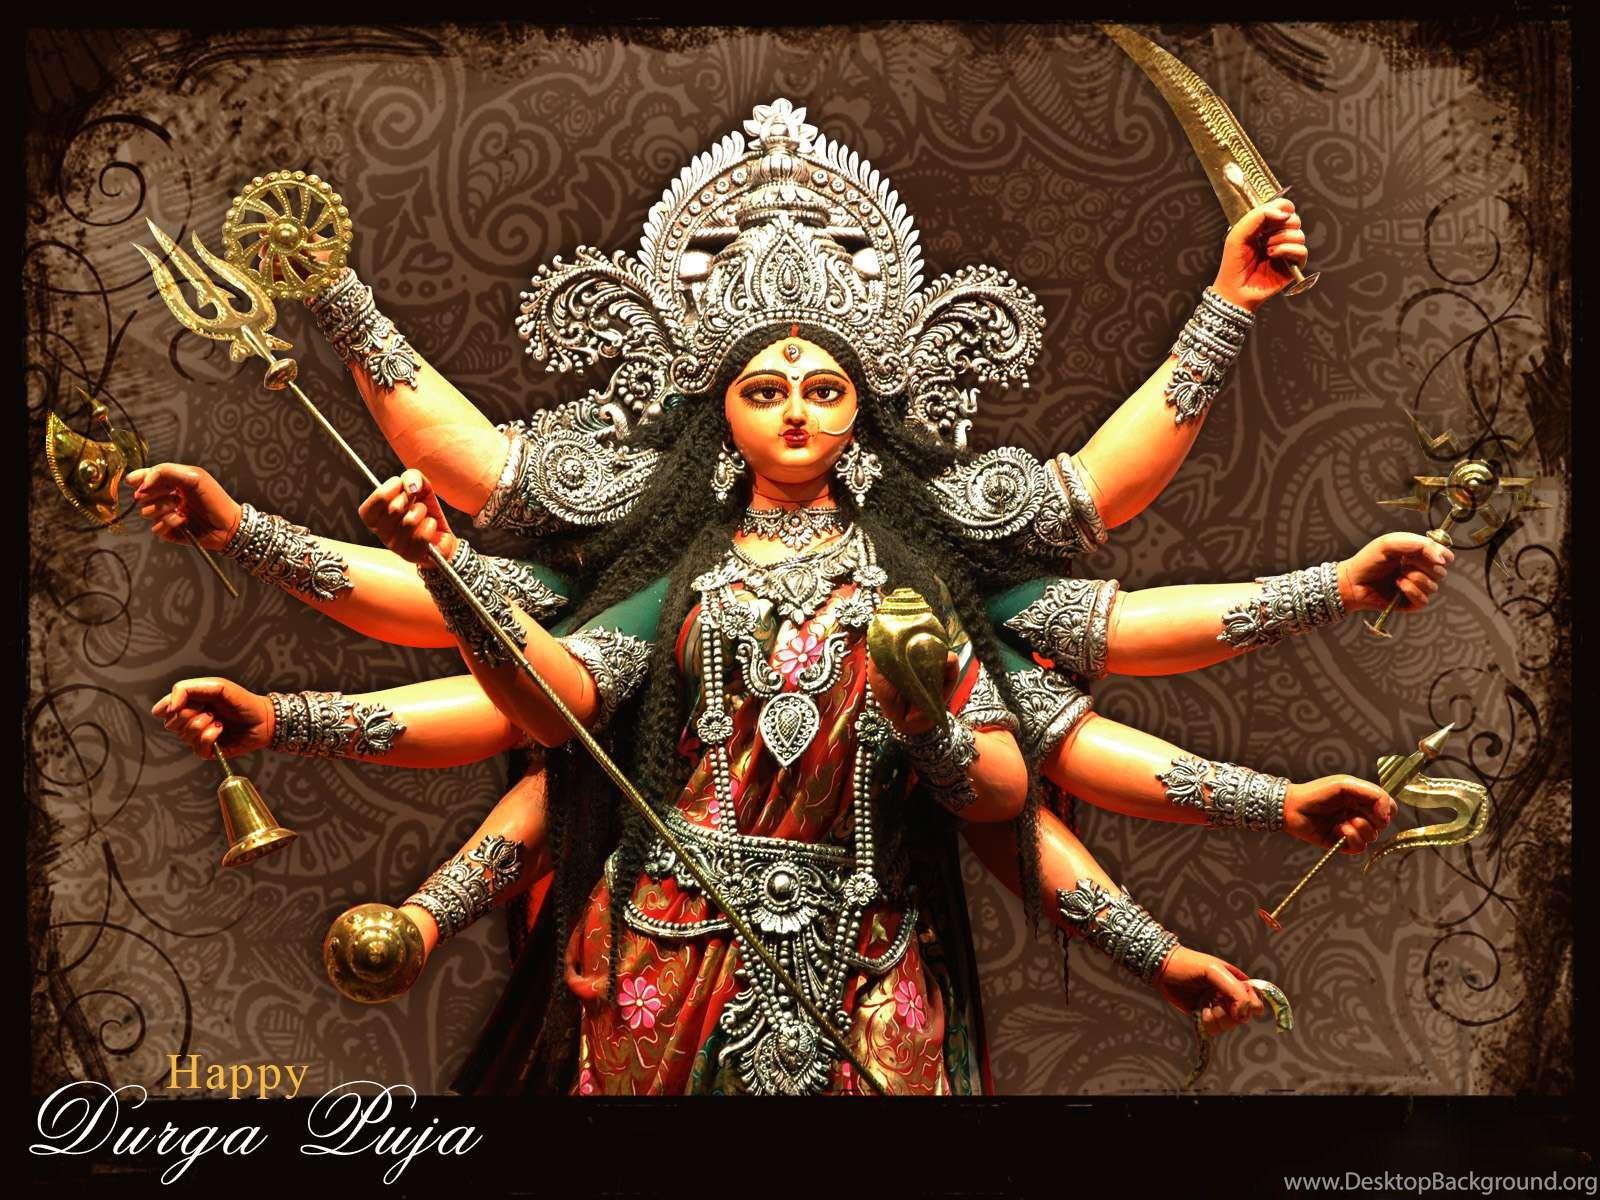 Durga Puja Durga Mata Picture Images Photos And Hd Wallpapers